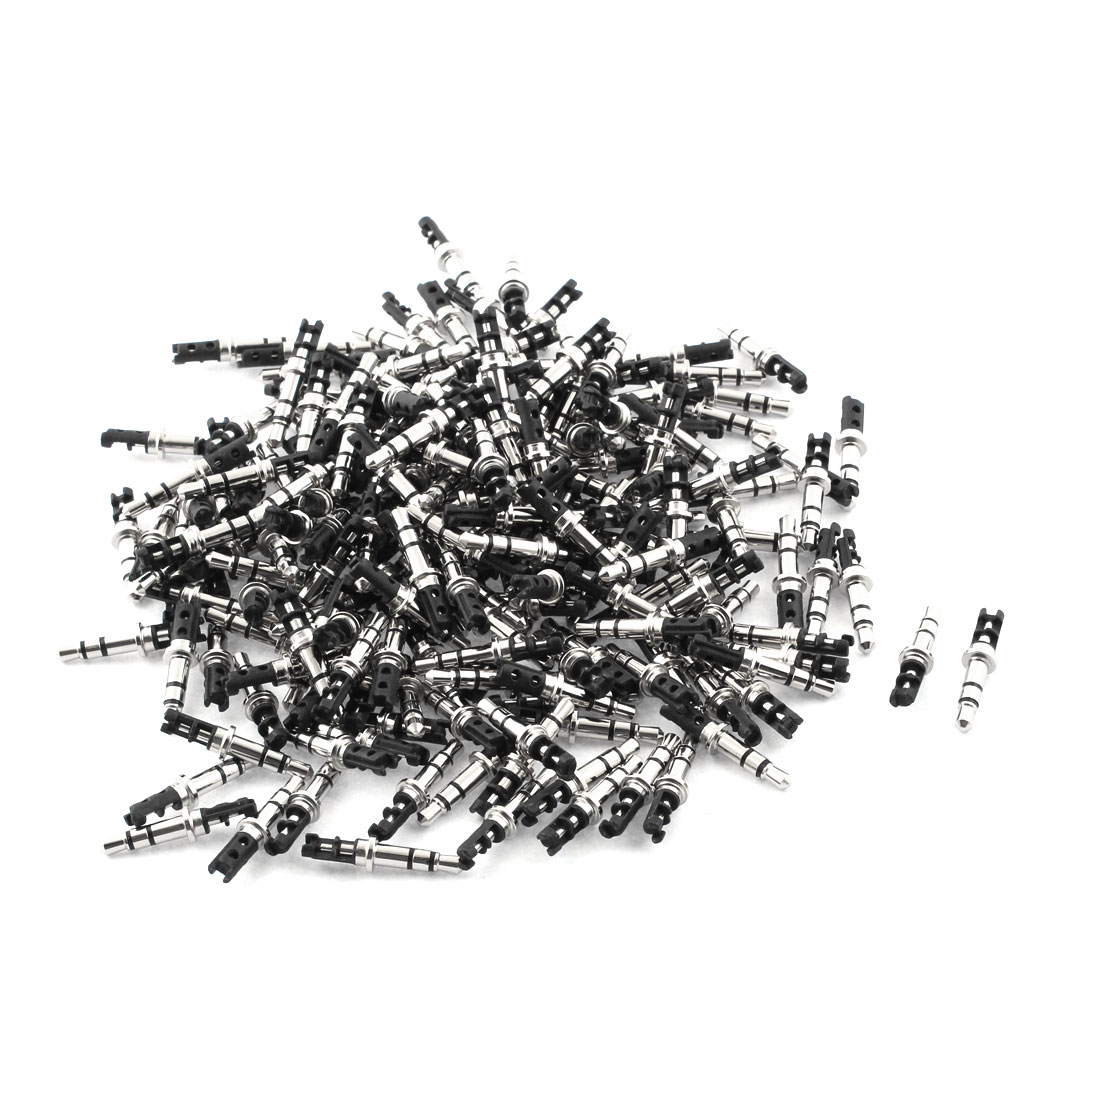 unique bargains 3 5mm stereo male plug repair audio headphone jack solder connector black 200pcs walmart canada [ 1100 x 1100 Pixel ]